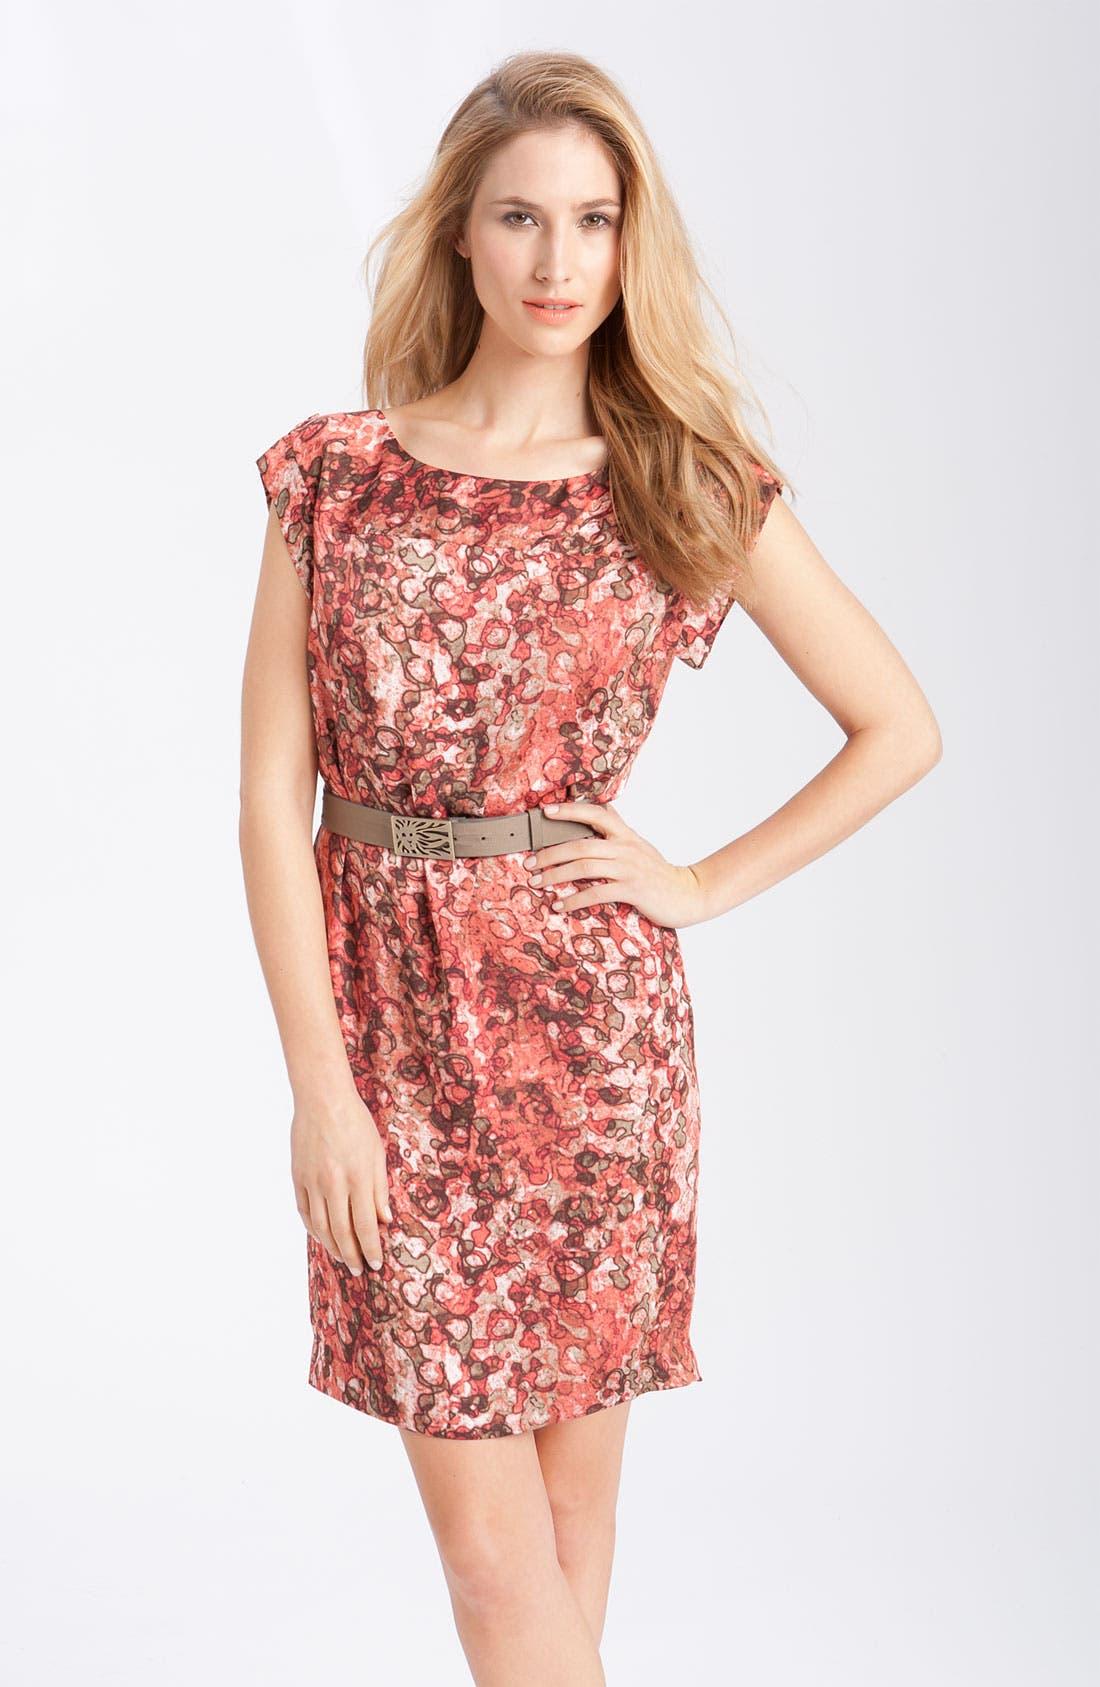 Main Image - Anne Klein 'Watermark Print' Belted Dress